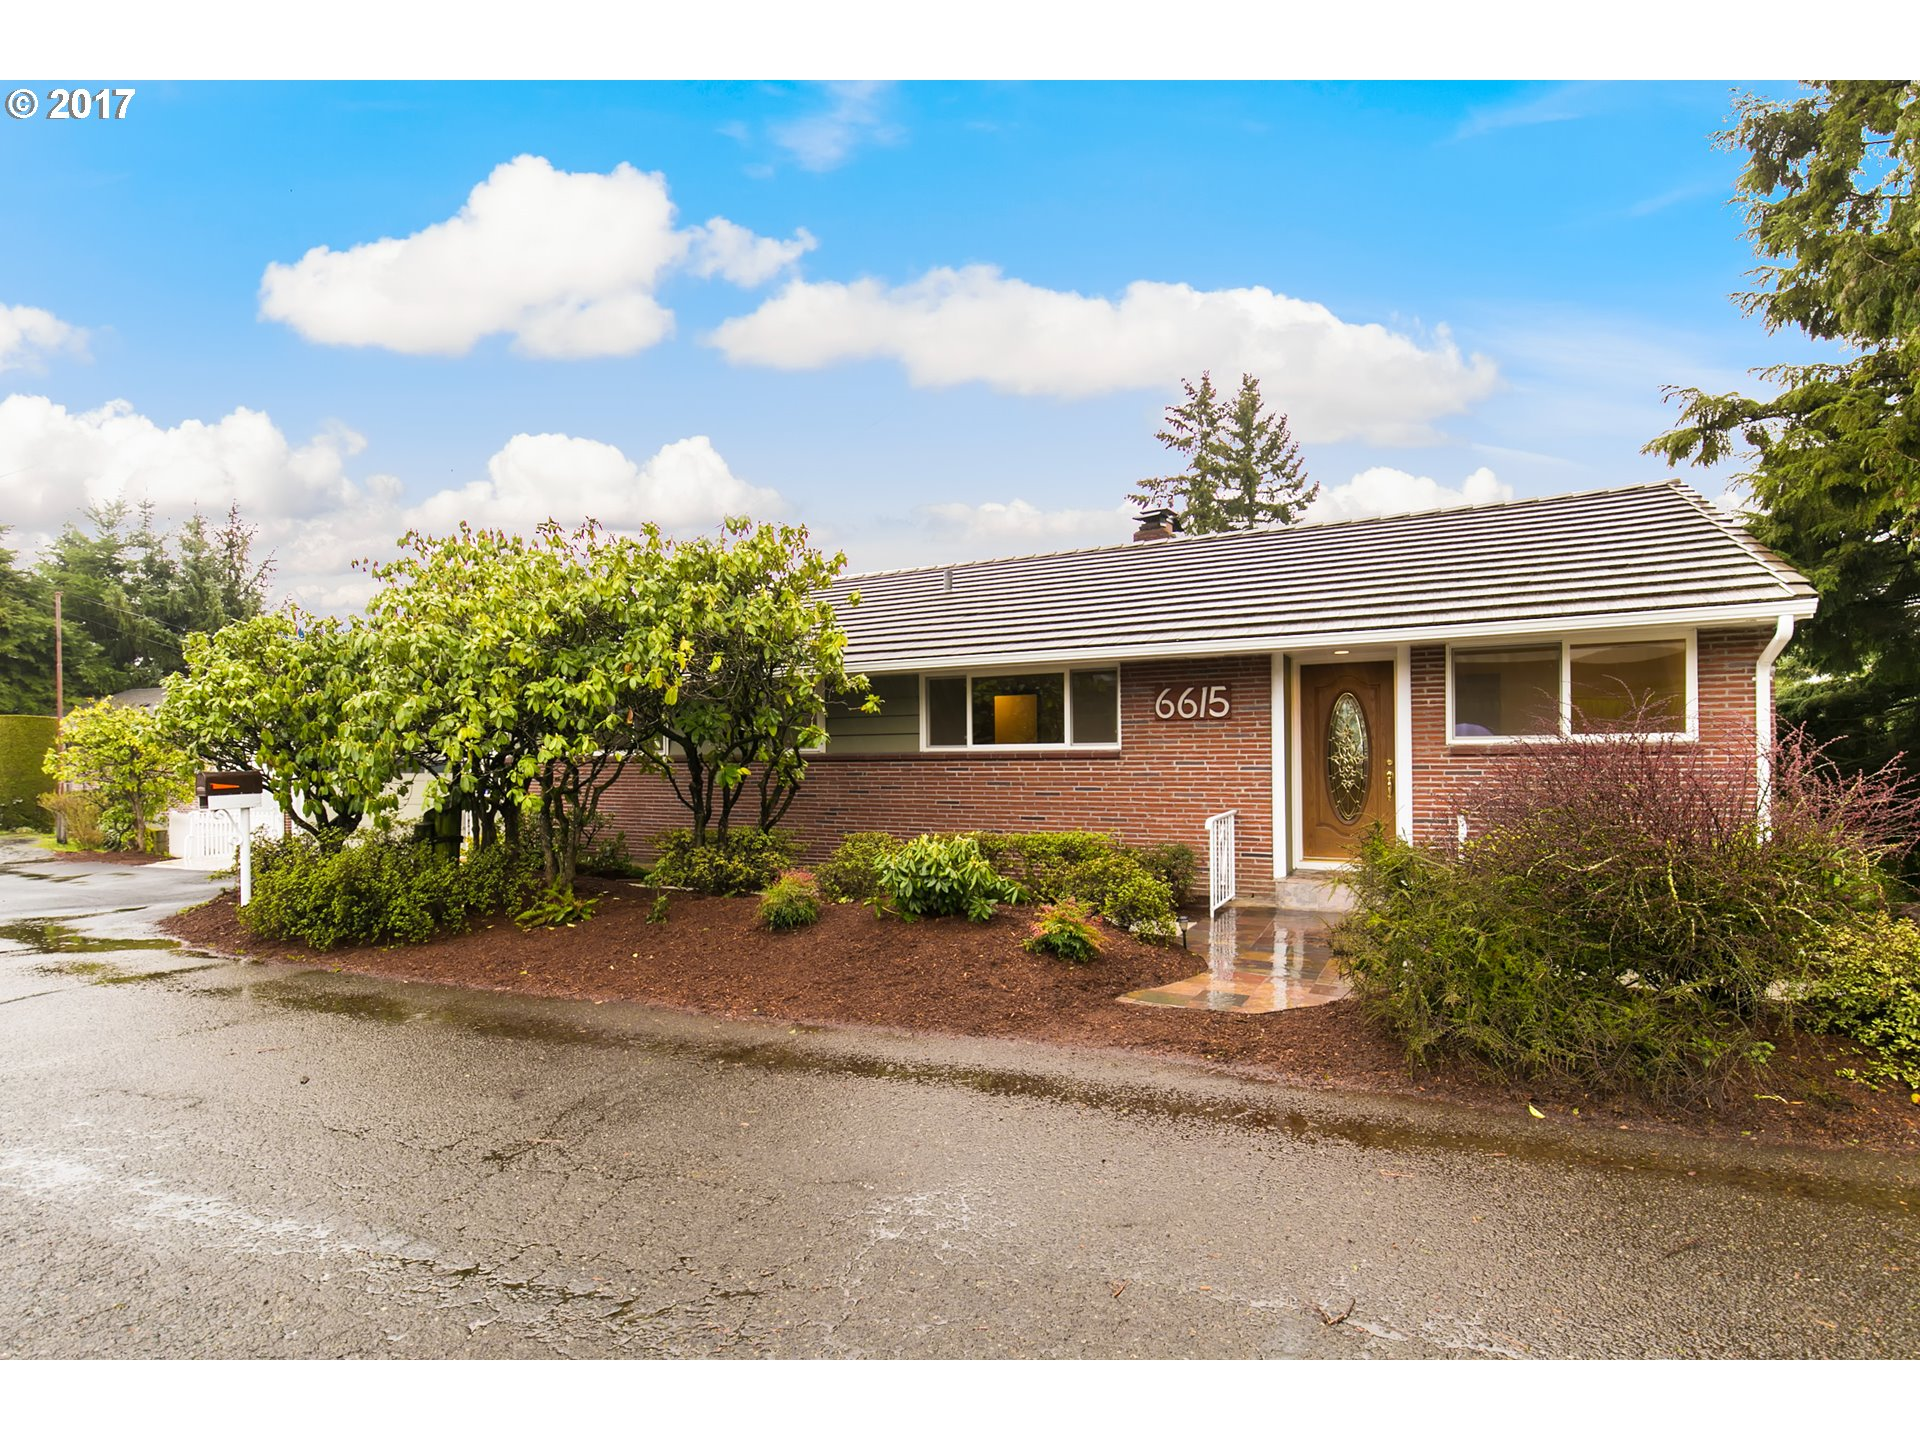 6615 SE EVERGREEN HWY, Vancouver, WA 98661